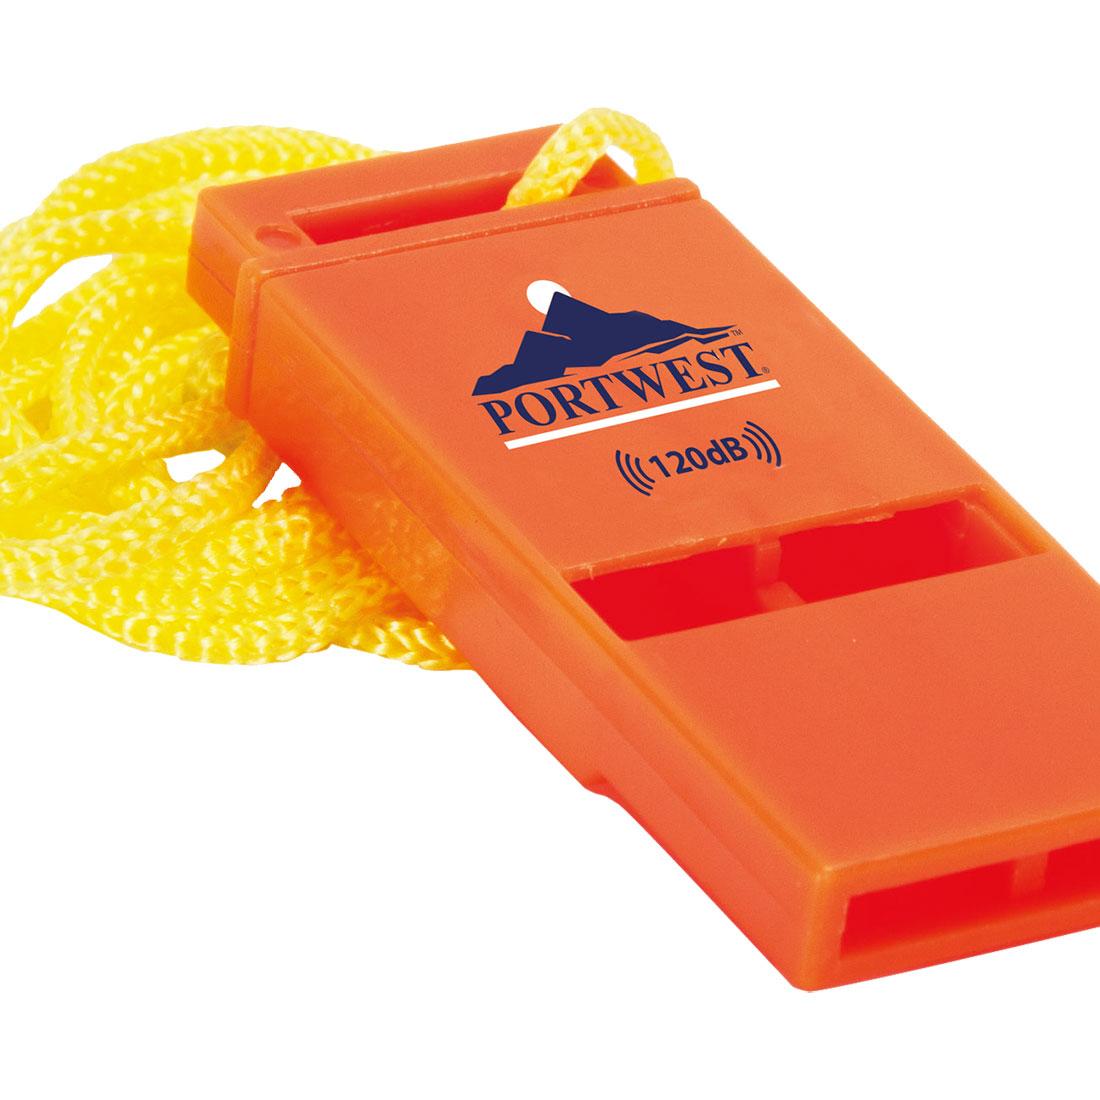 Portwest Slimline 120dB Safety Whistle - PA99